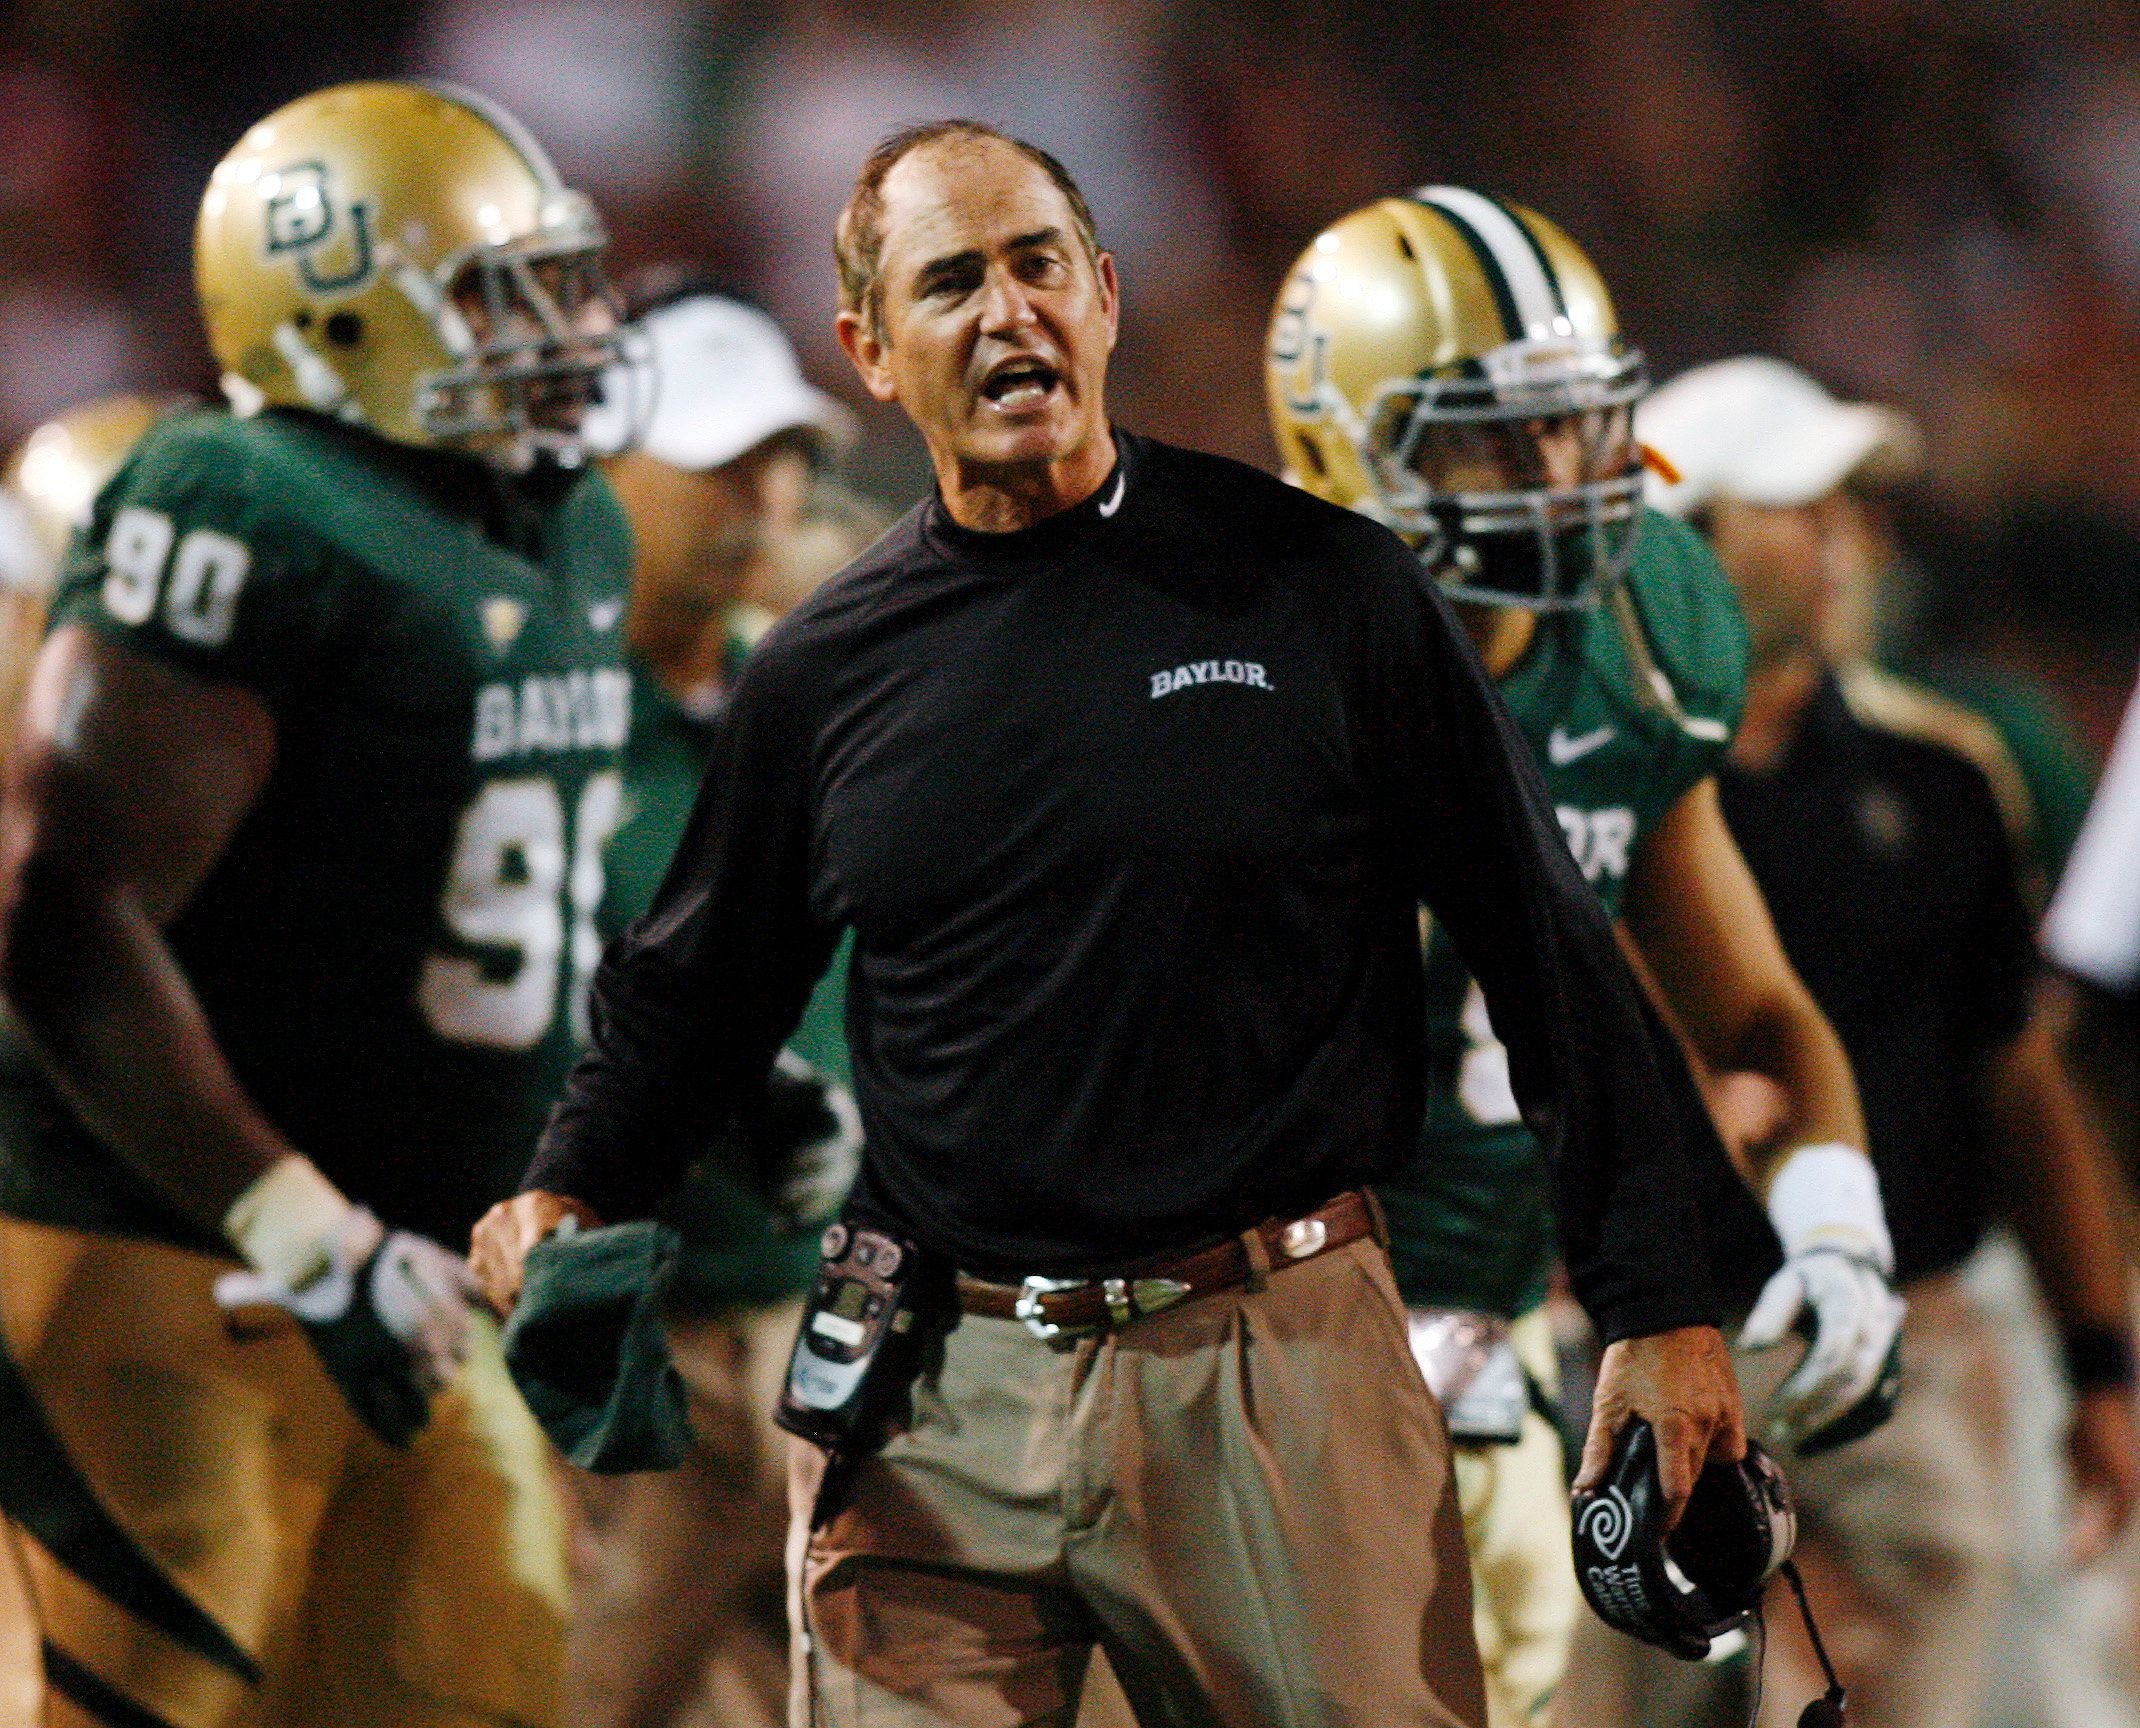 Football coach Art Briles lost hisjob last year amidgrowingaccusations of sexual misconductinvolving&